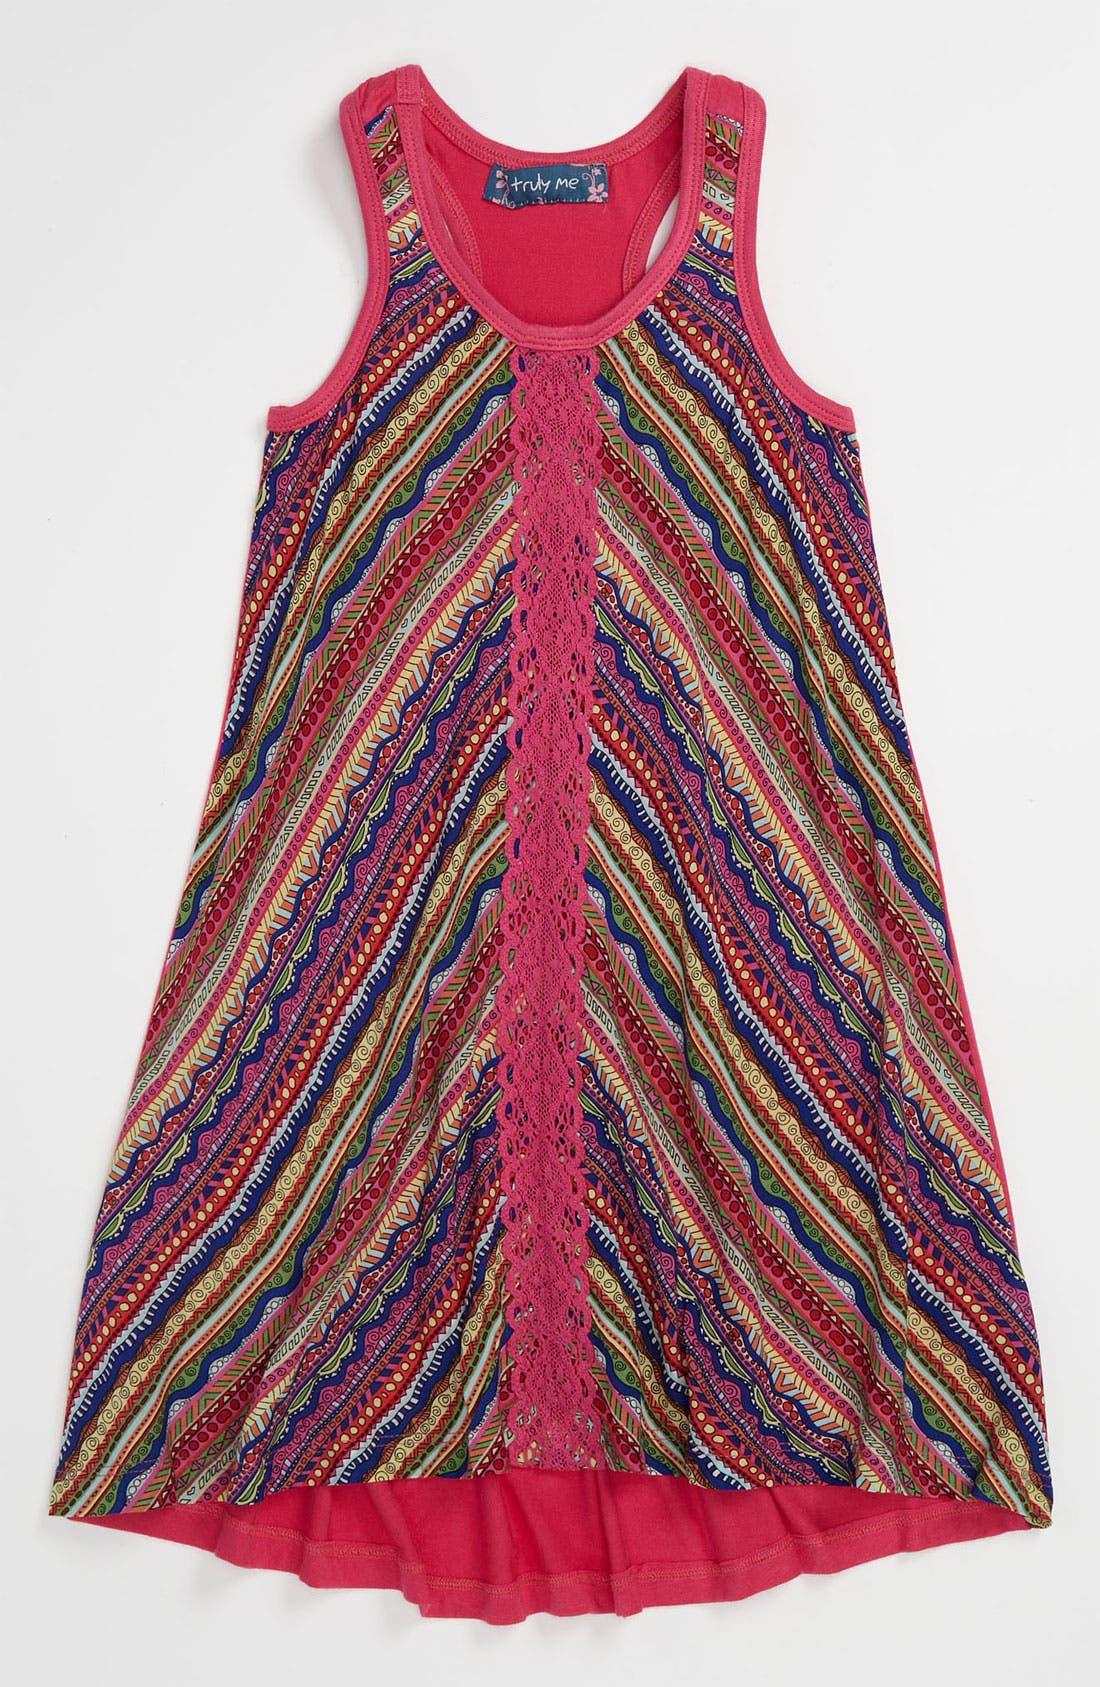 Alternate Image 1 Selected - Truly Me Stripe Dress (Little Girls)